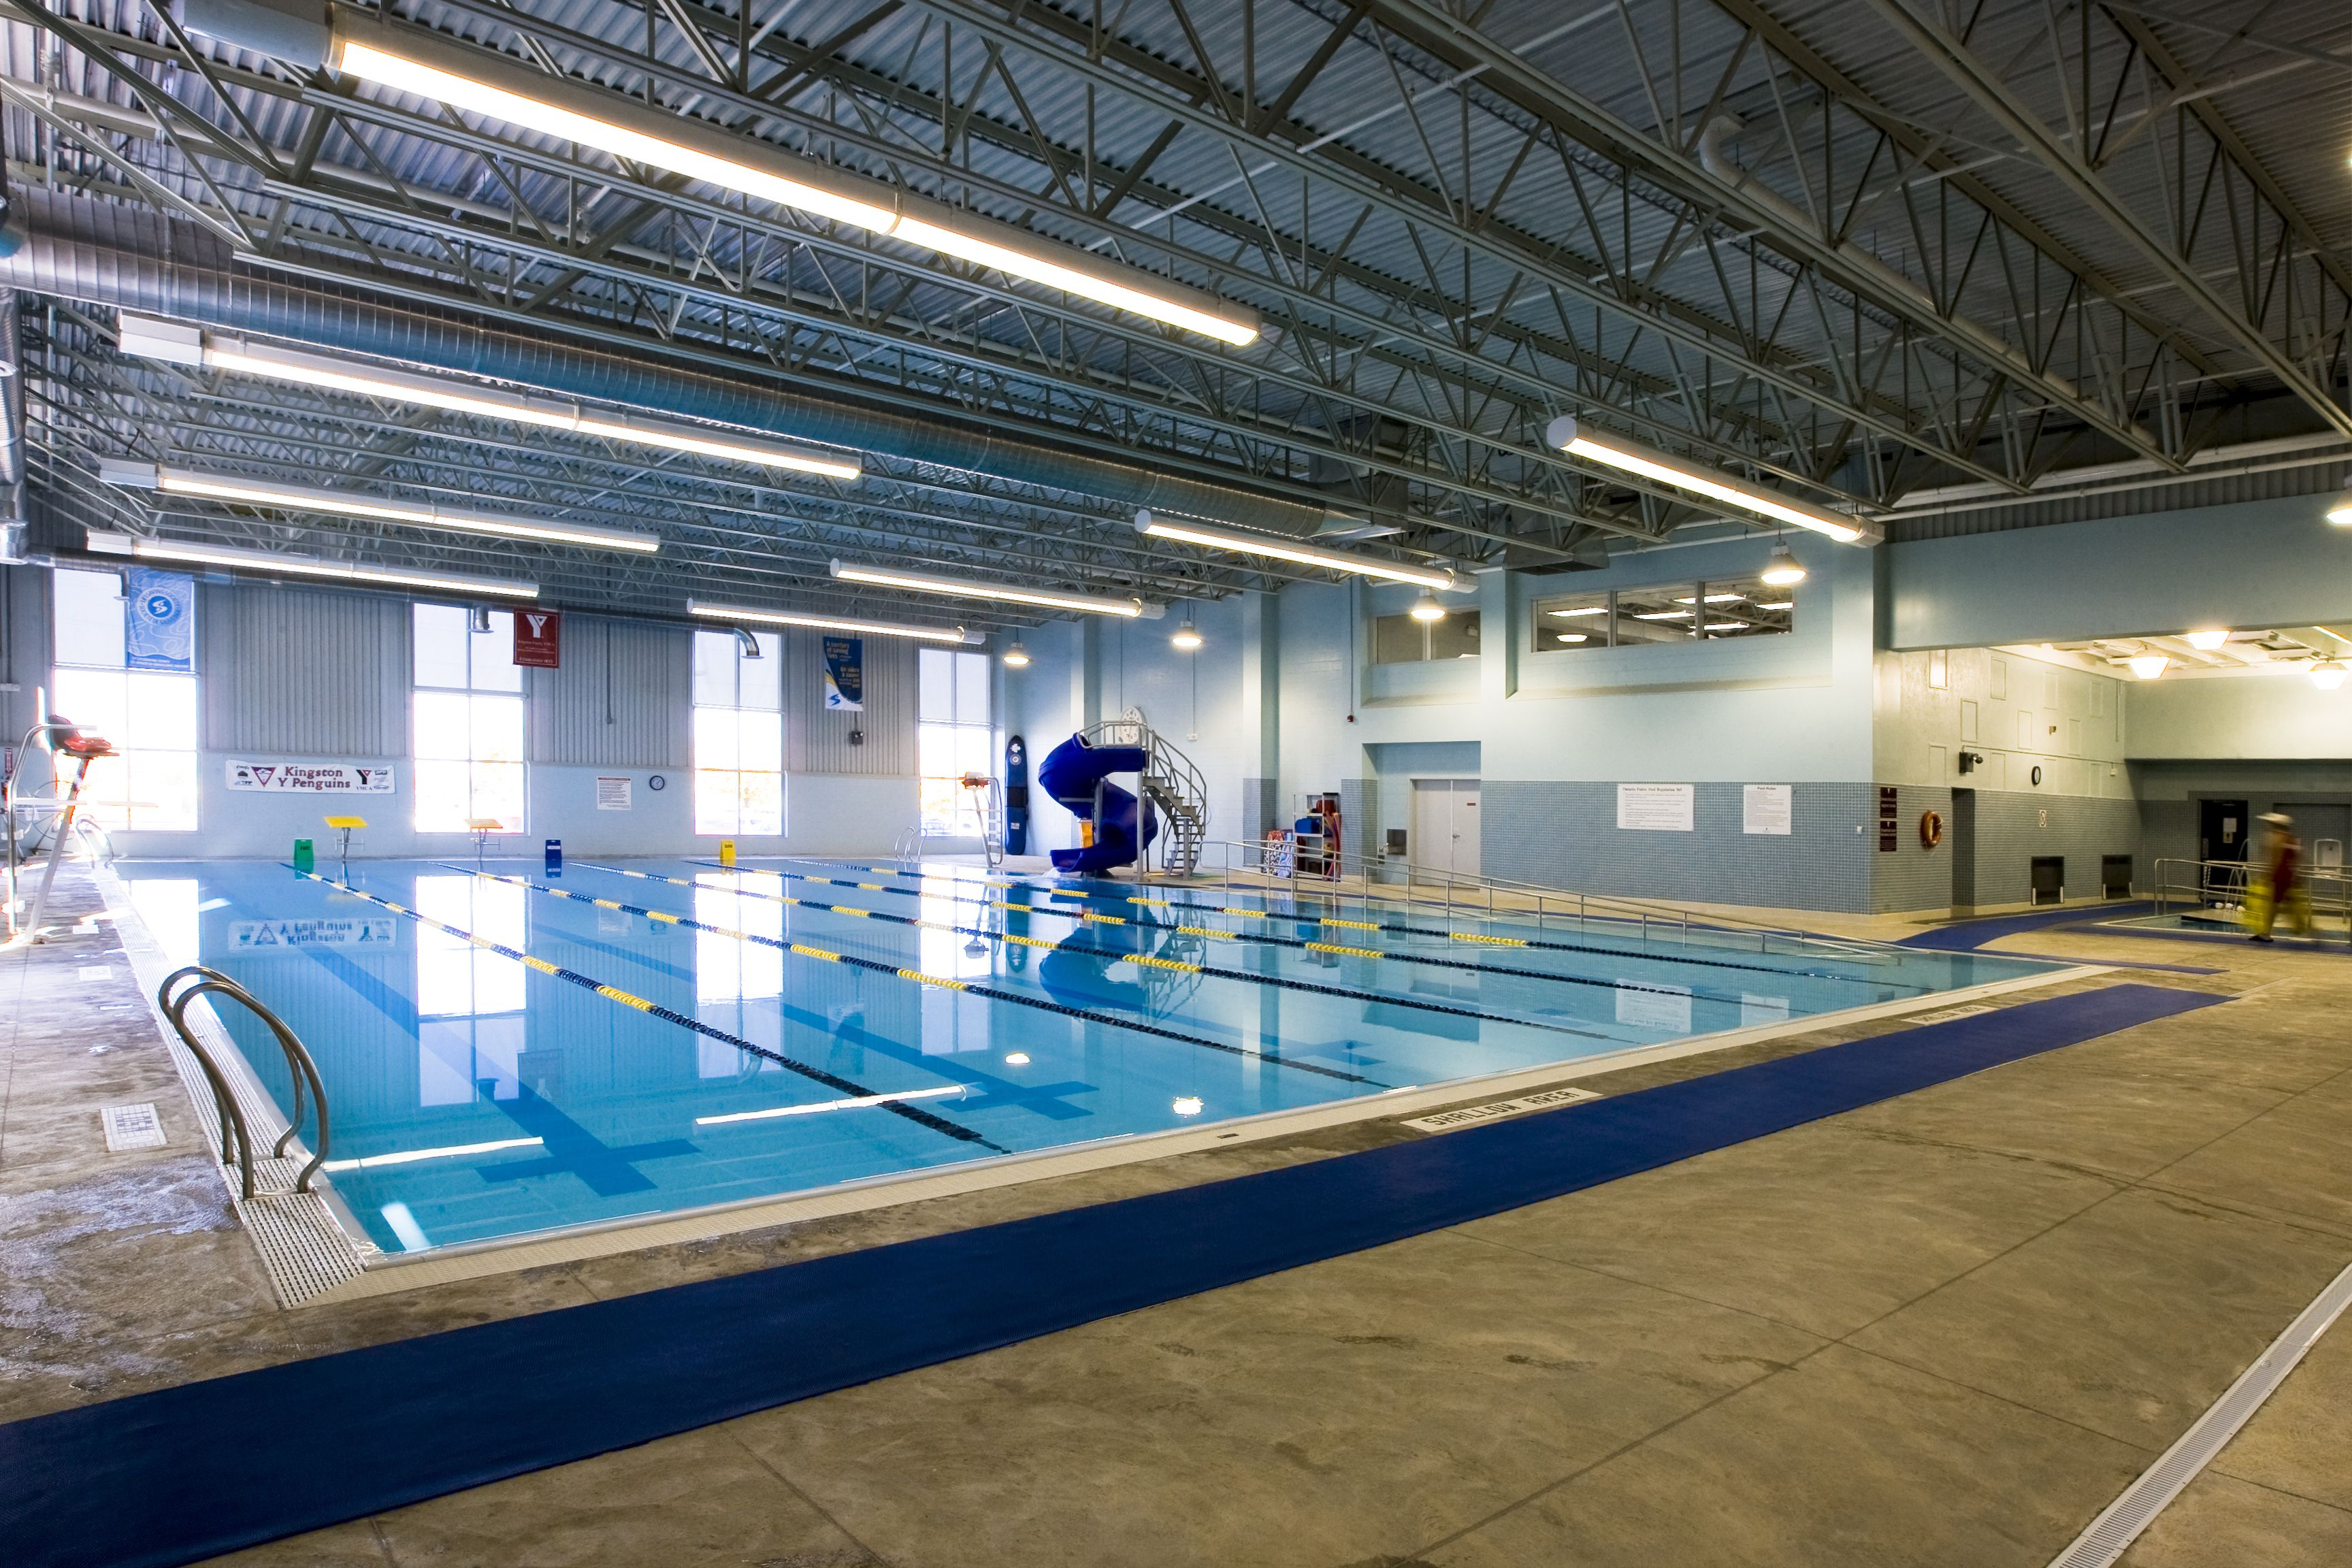 YMCA Kingston pool renovation | Commercial Swimming Pool Installs ...